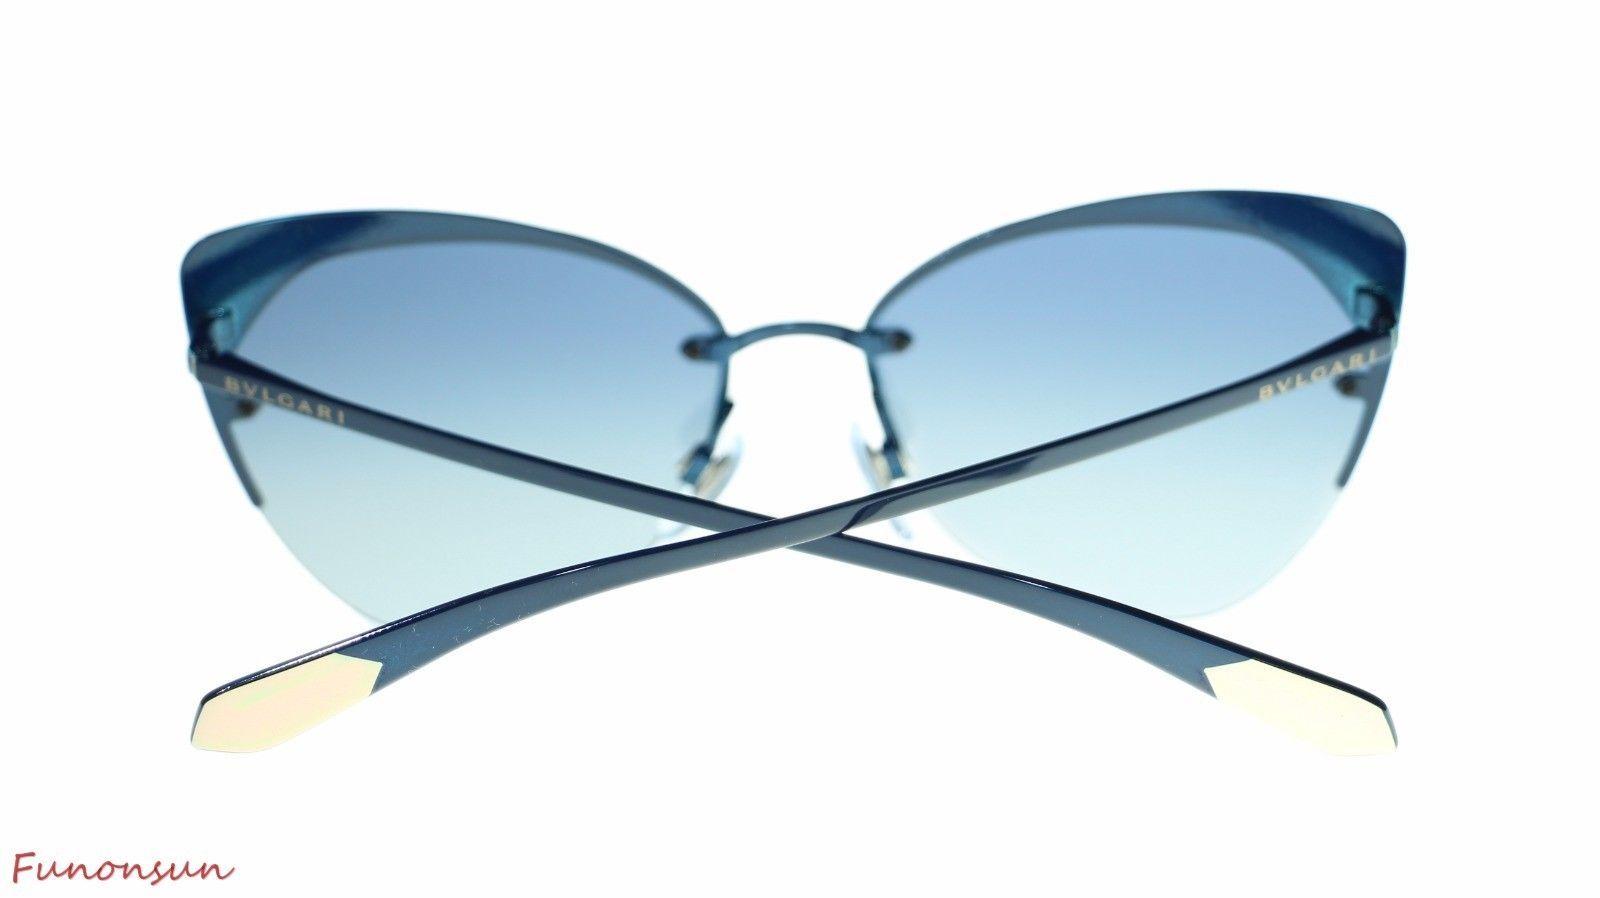 BVLGARI Women's Round Sunglasses BV6096 20204L Blue/Blue Grey Gradient Lens 58mm